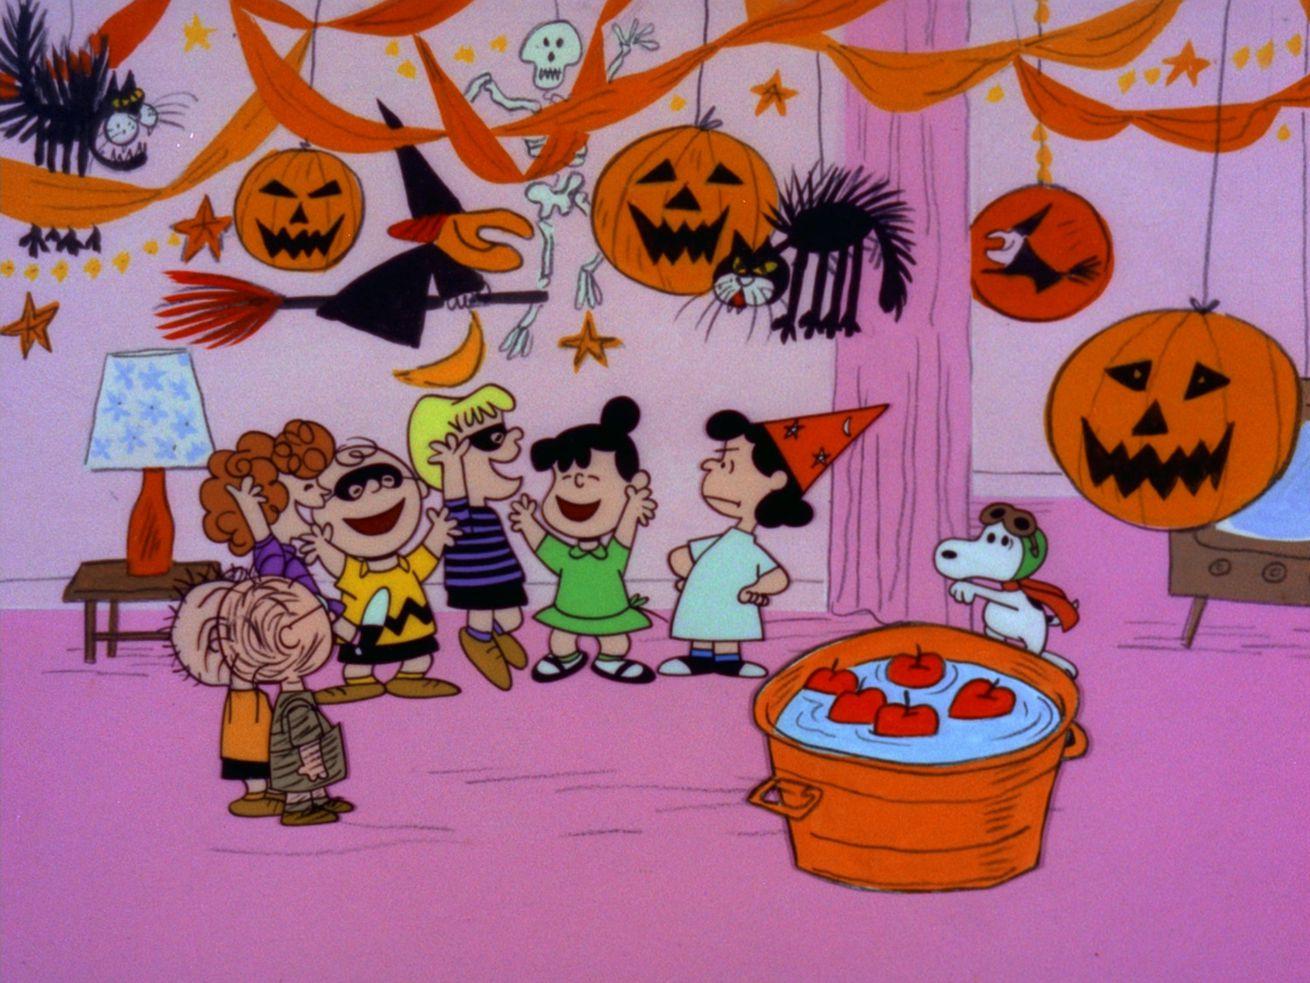 Snoopy se faufile dans la fête d'Halloween dans It's the Great Pumpkin, Charlie Brown.